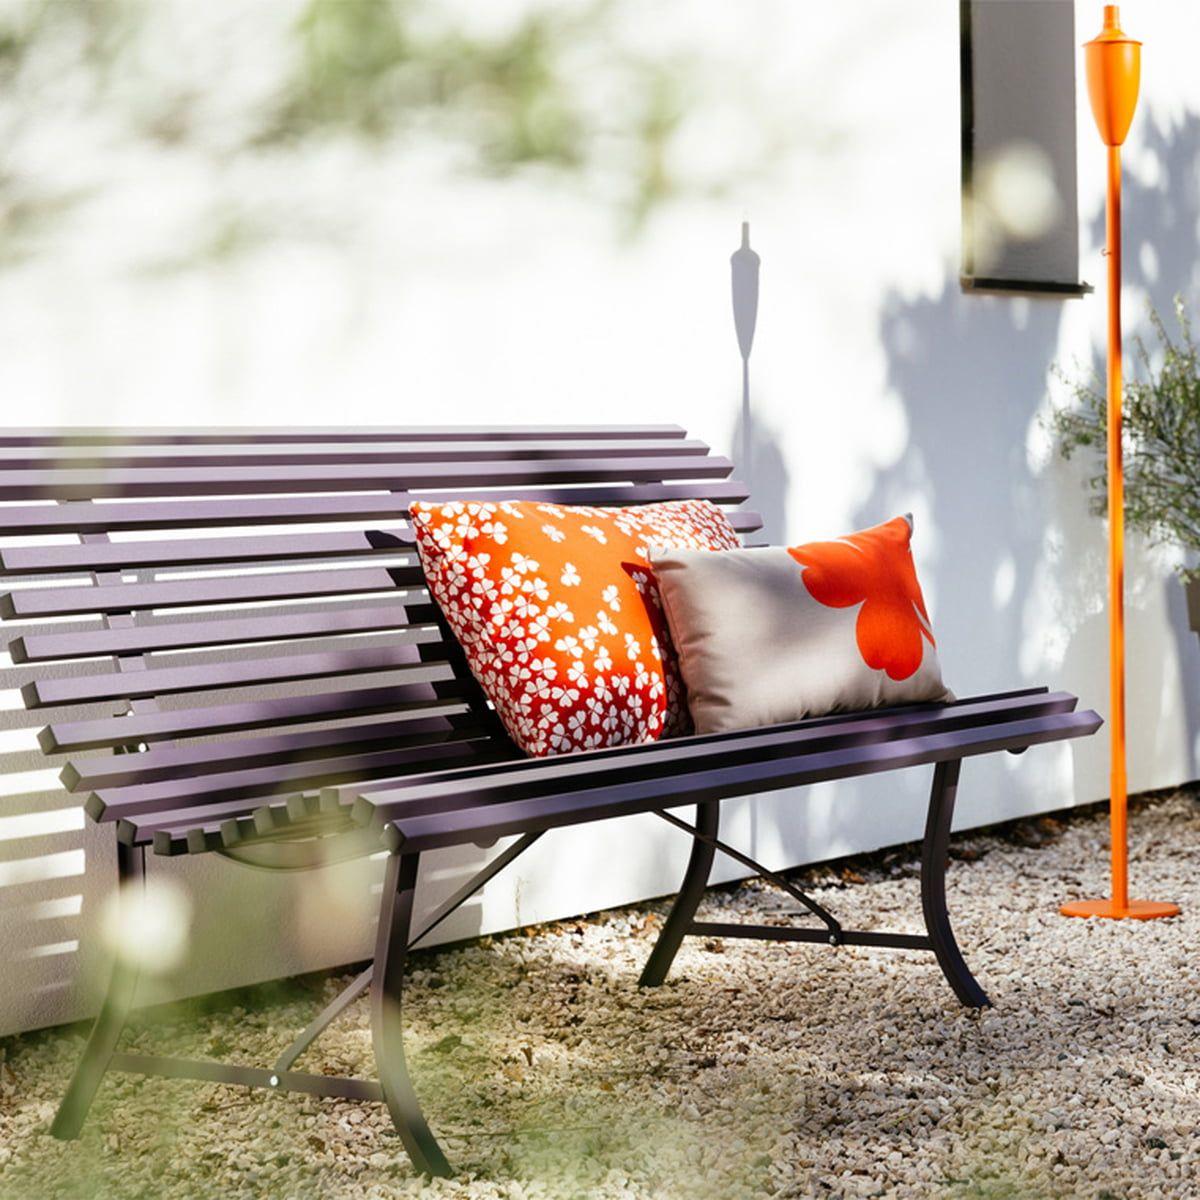 Louisiane Bank 200 Cm Von Fermob Connox In 2021 Outdoor Gartenbank Holzbank Garten Gartenbank